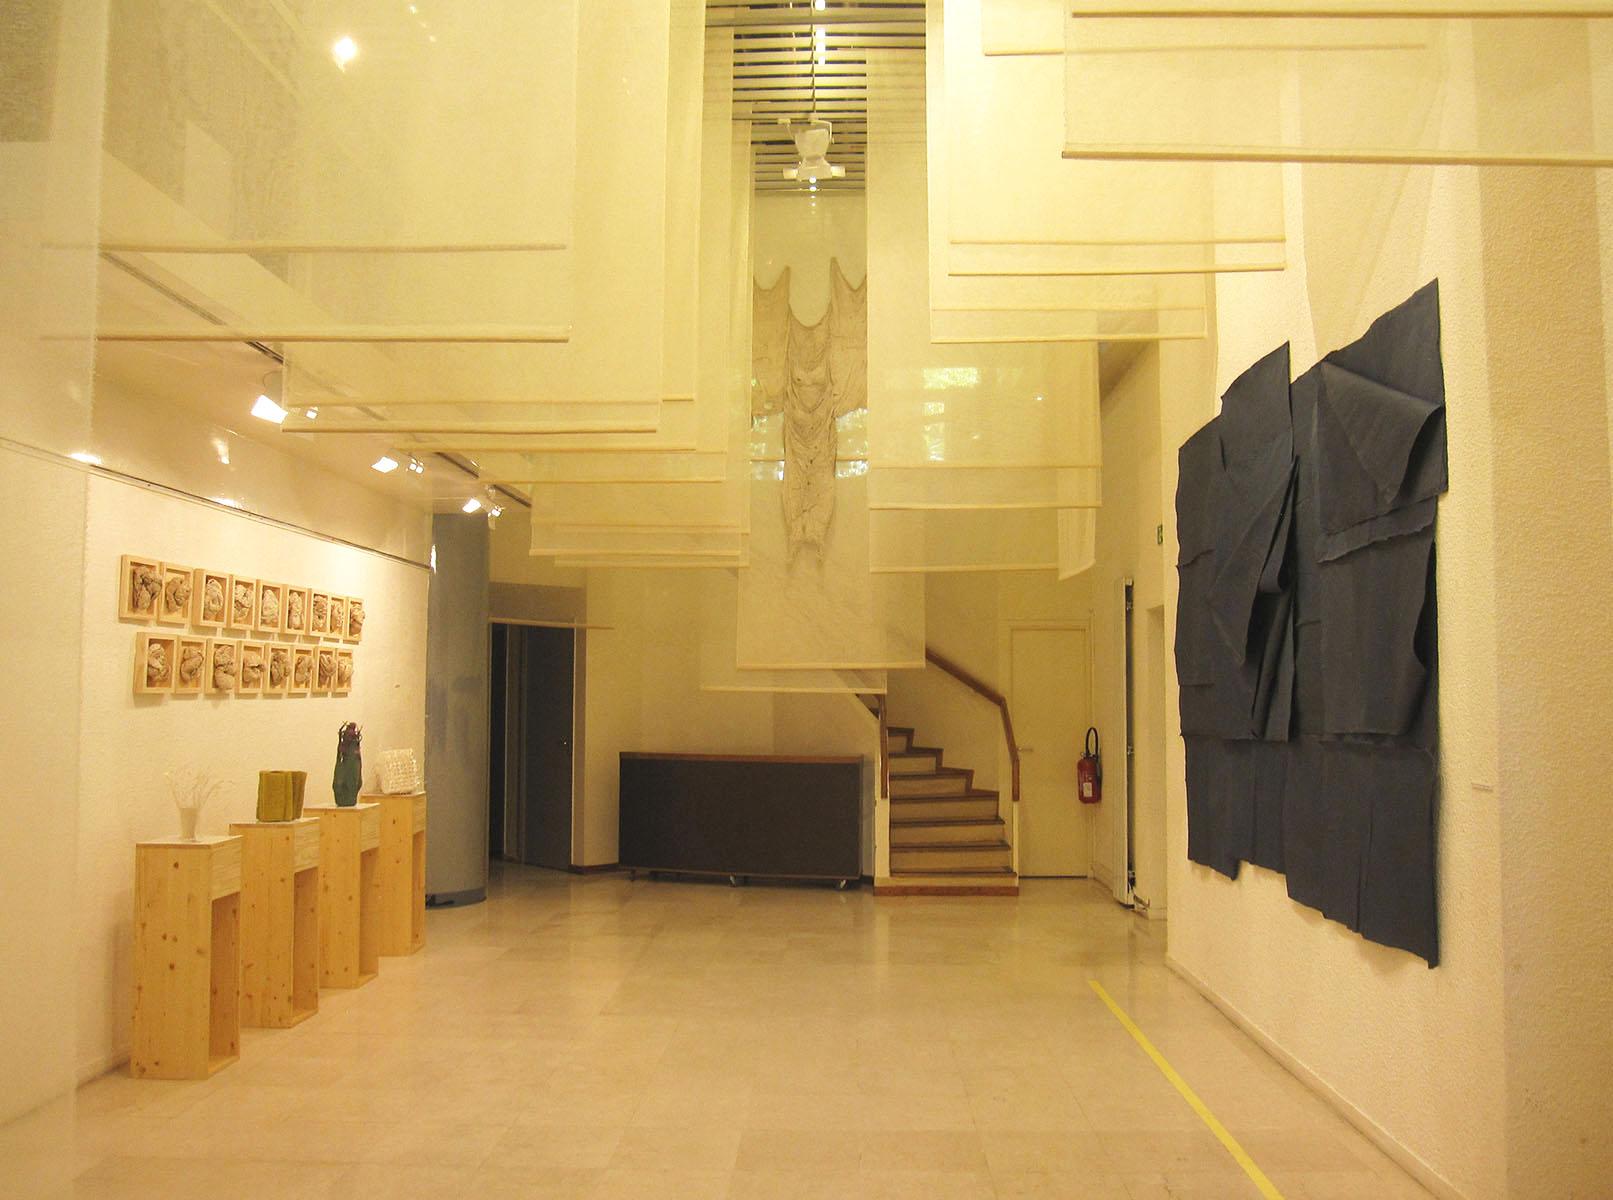 hanji papier cor en centre culturel coreen 2015 kim sang lan. Black Bedroom Furniture Sets. Home Design Ideas